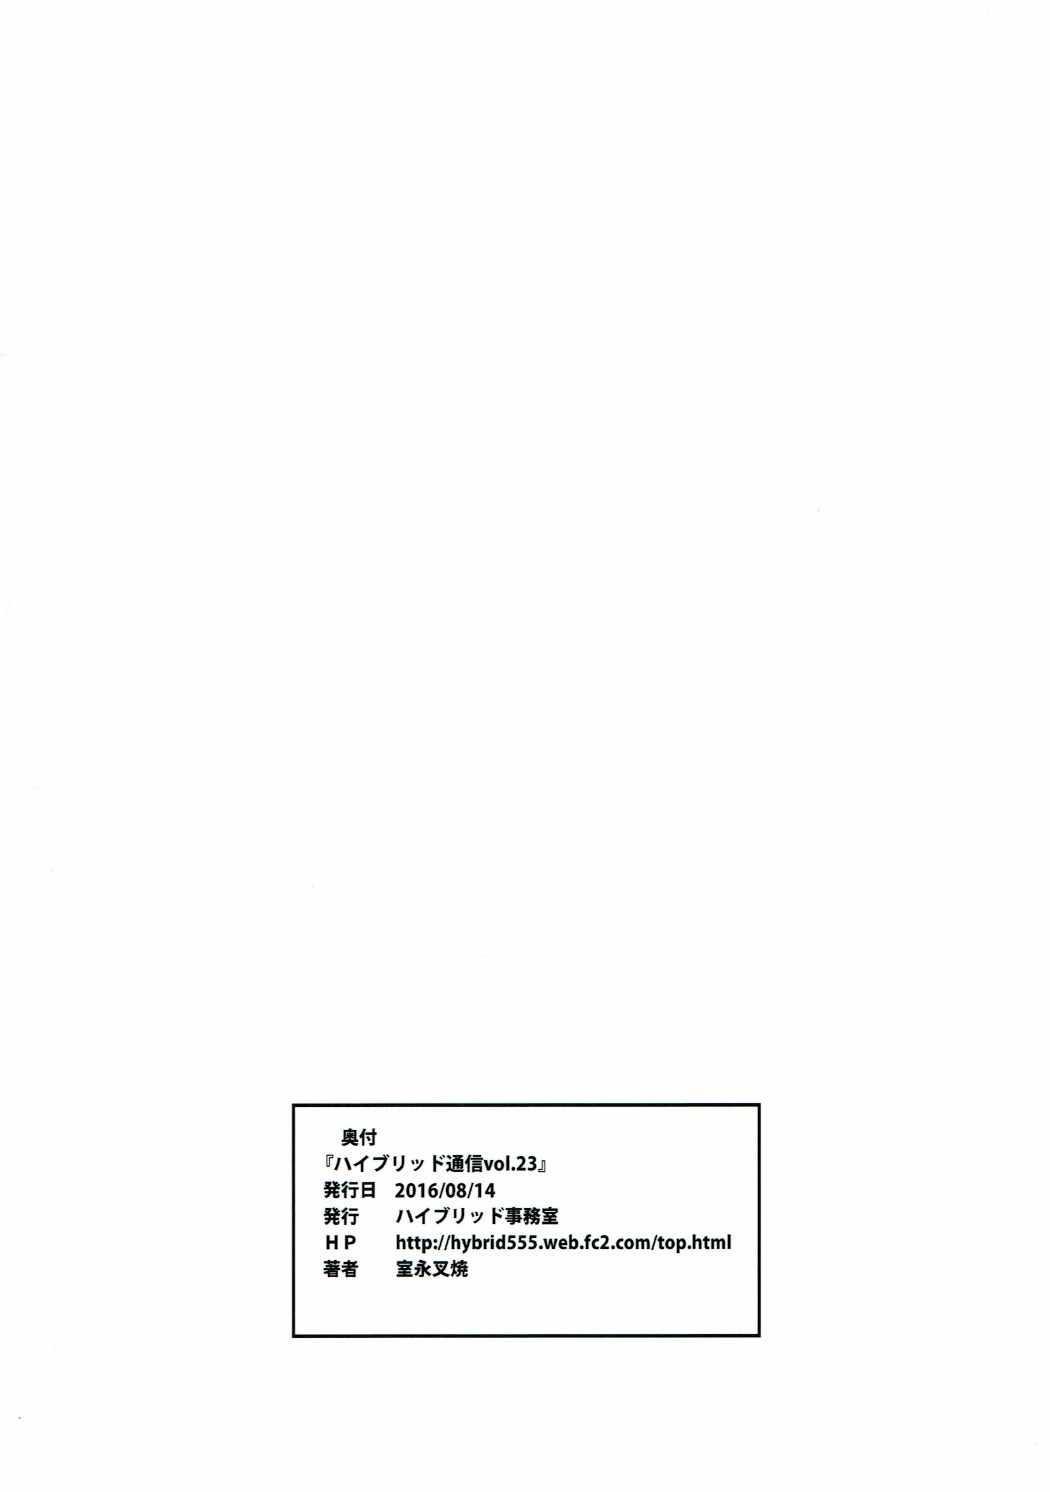 Hybrid Tsuushin Vol. 23 17